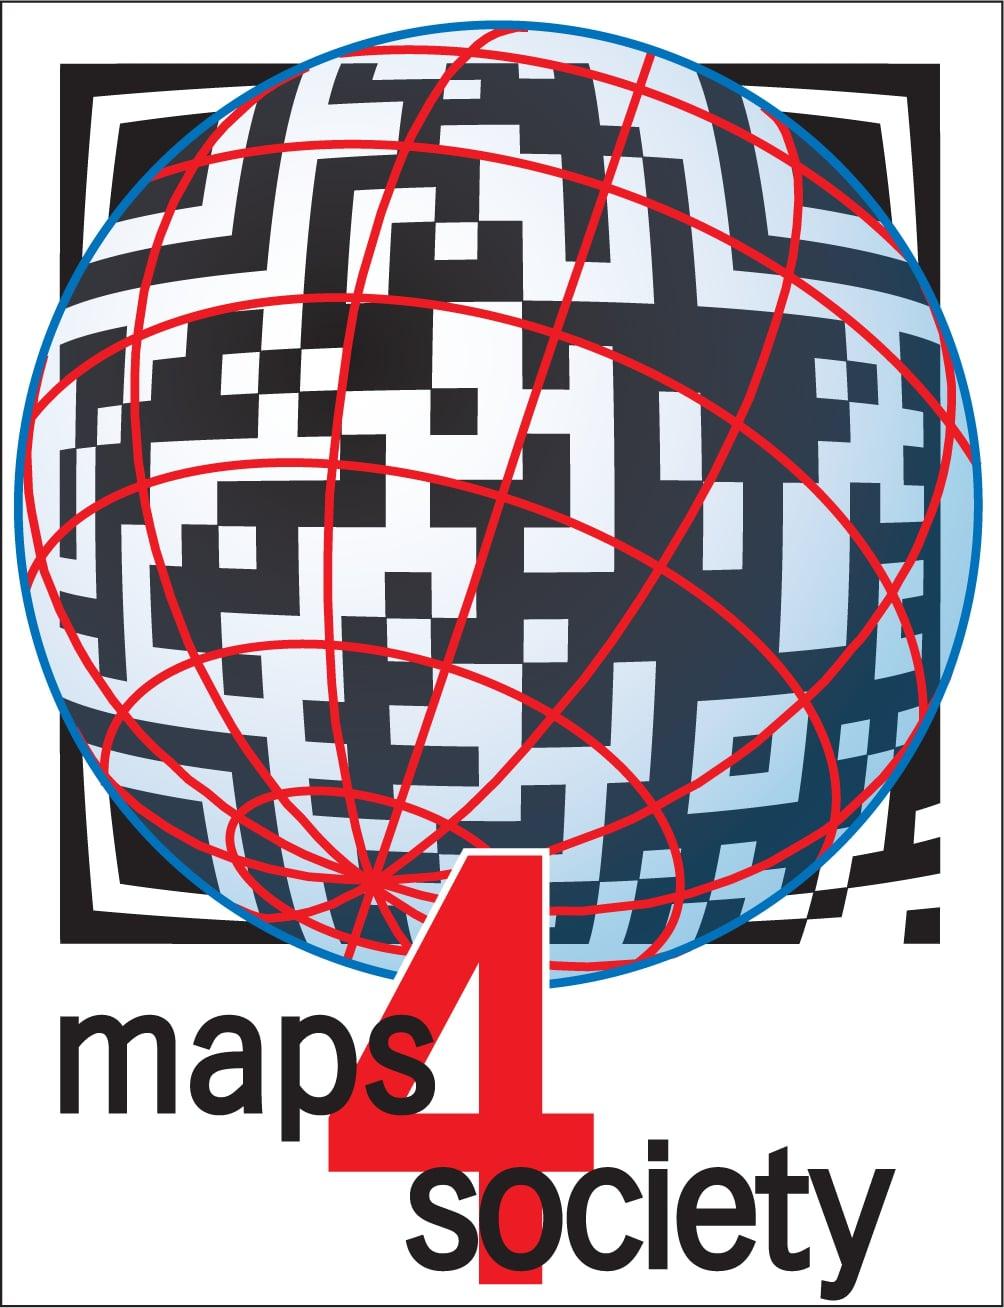 Maps4Society